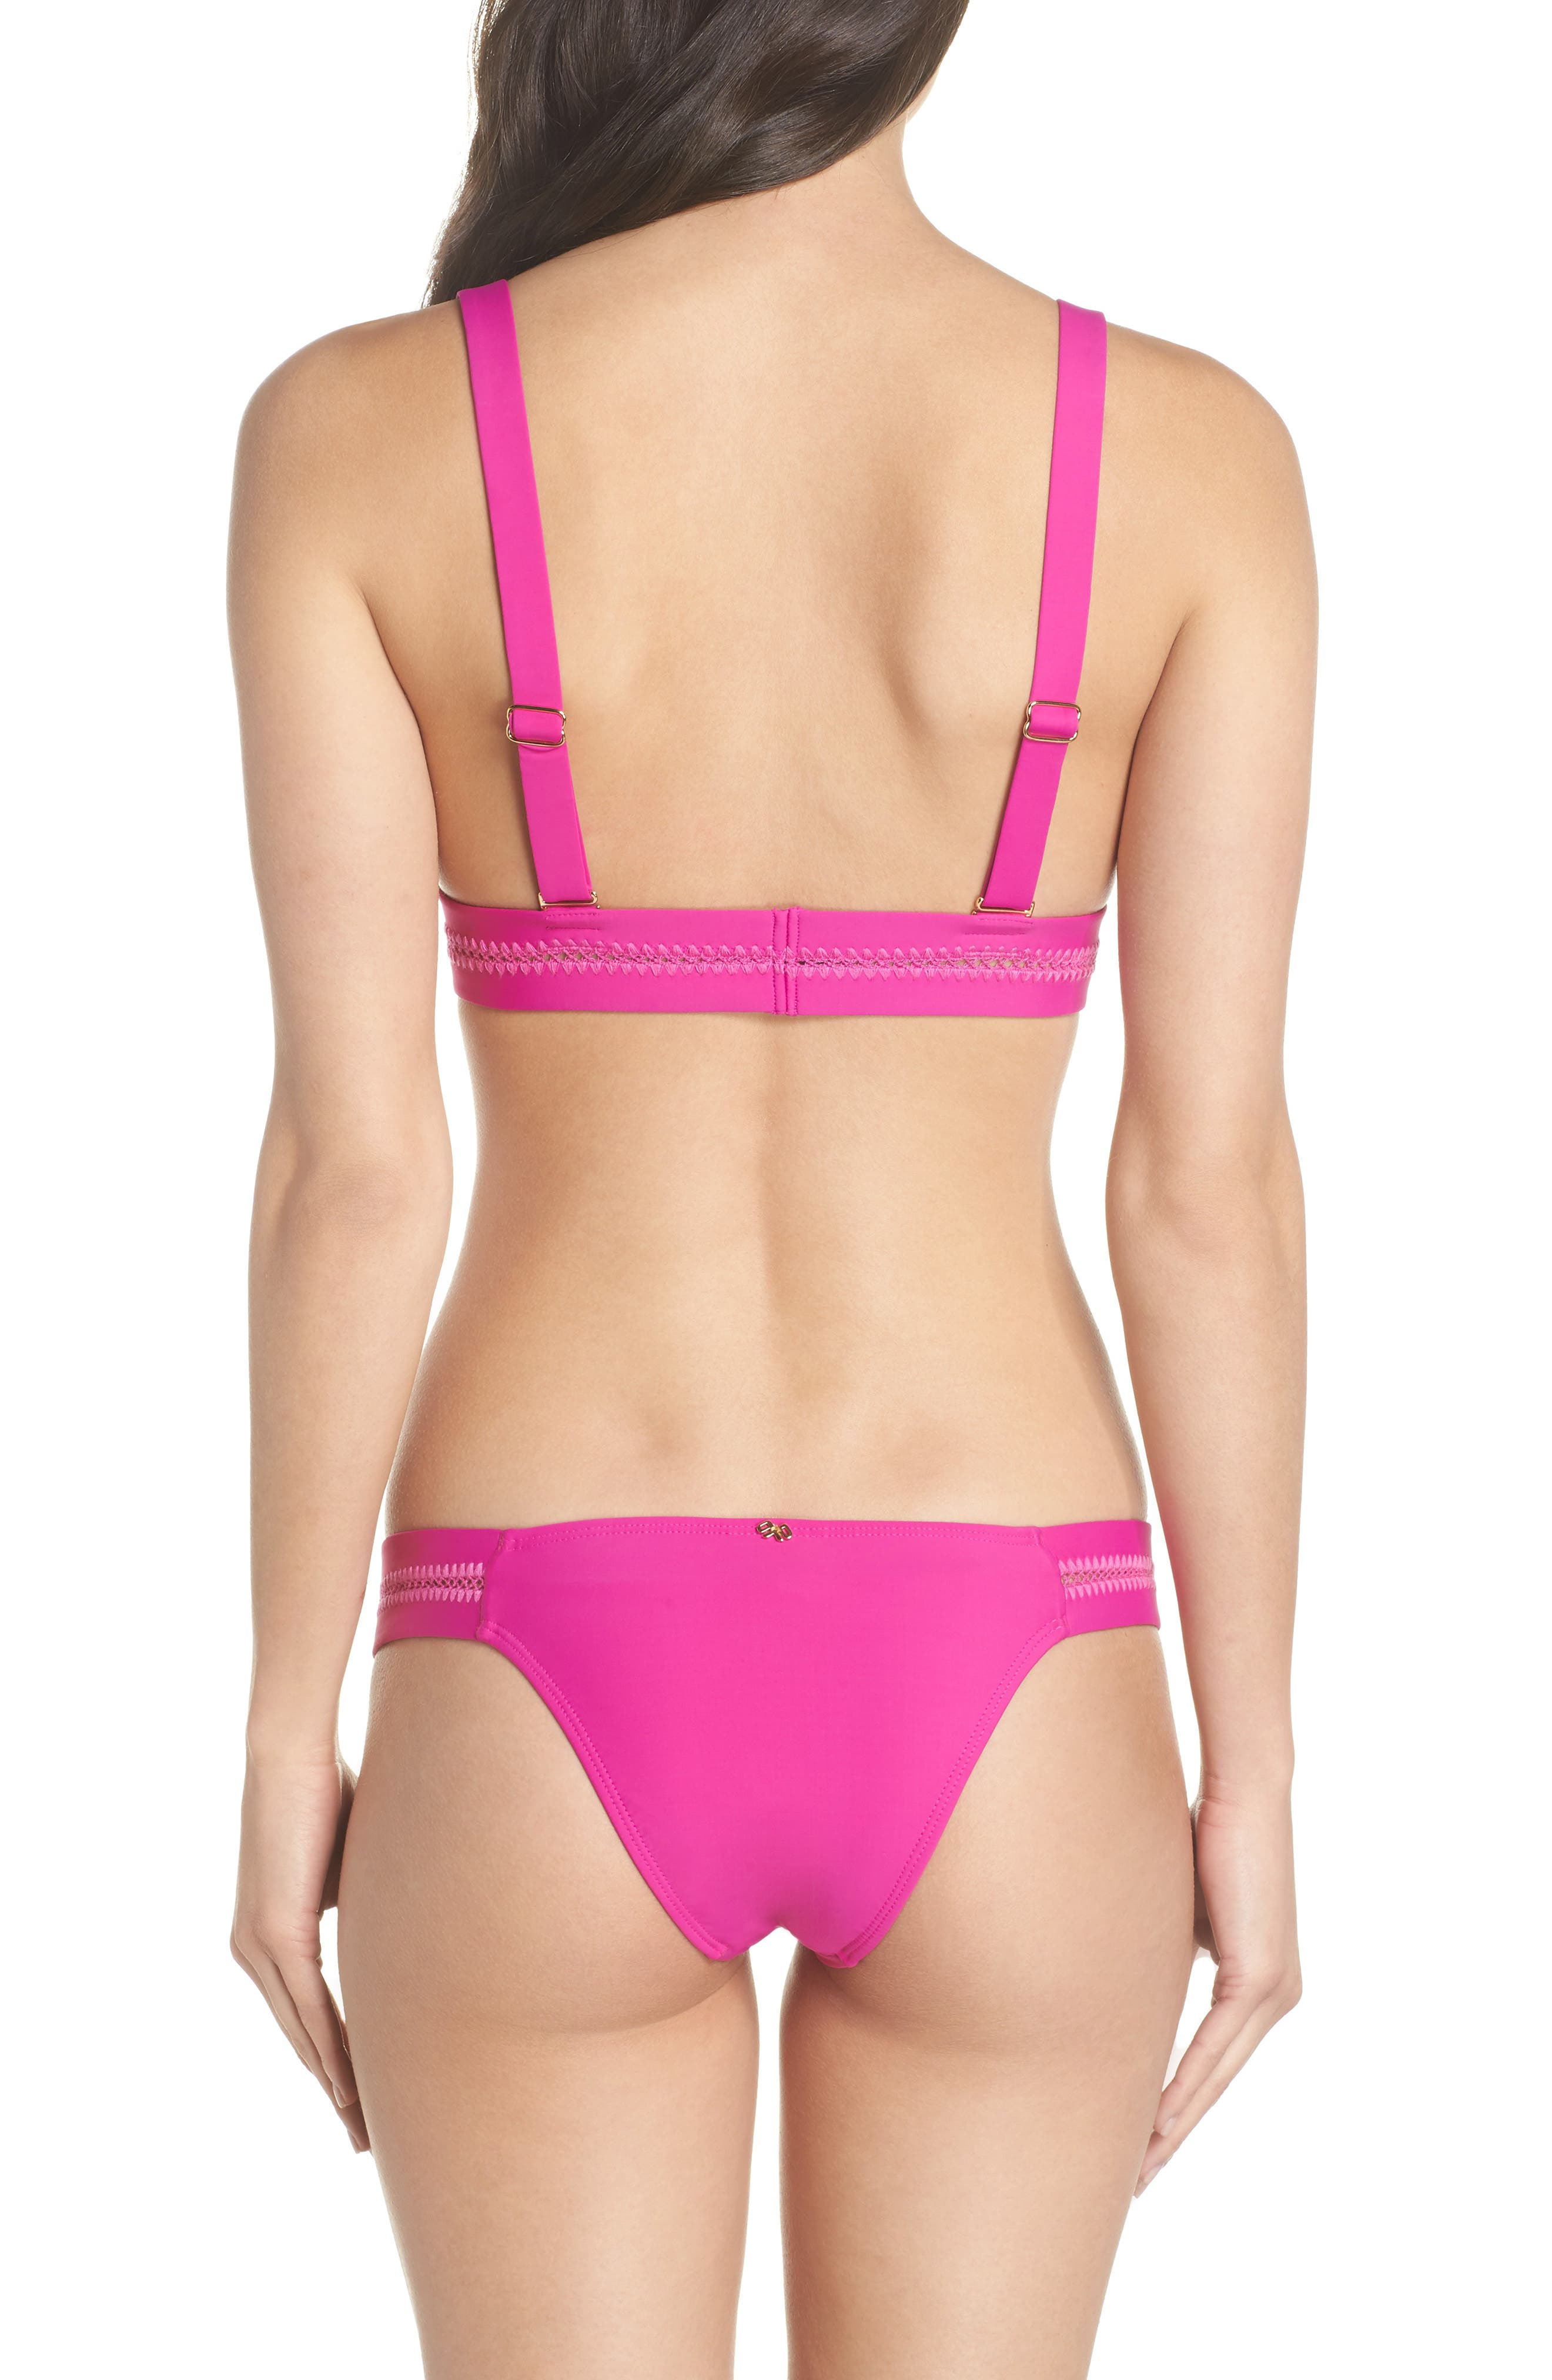 Stitched Elle Halter Bikini Top,                             Alternate thumbnail 3, color,                             Fuchsia